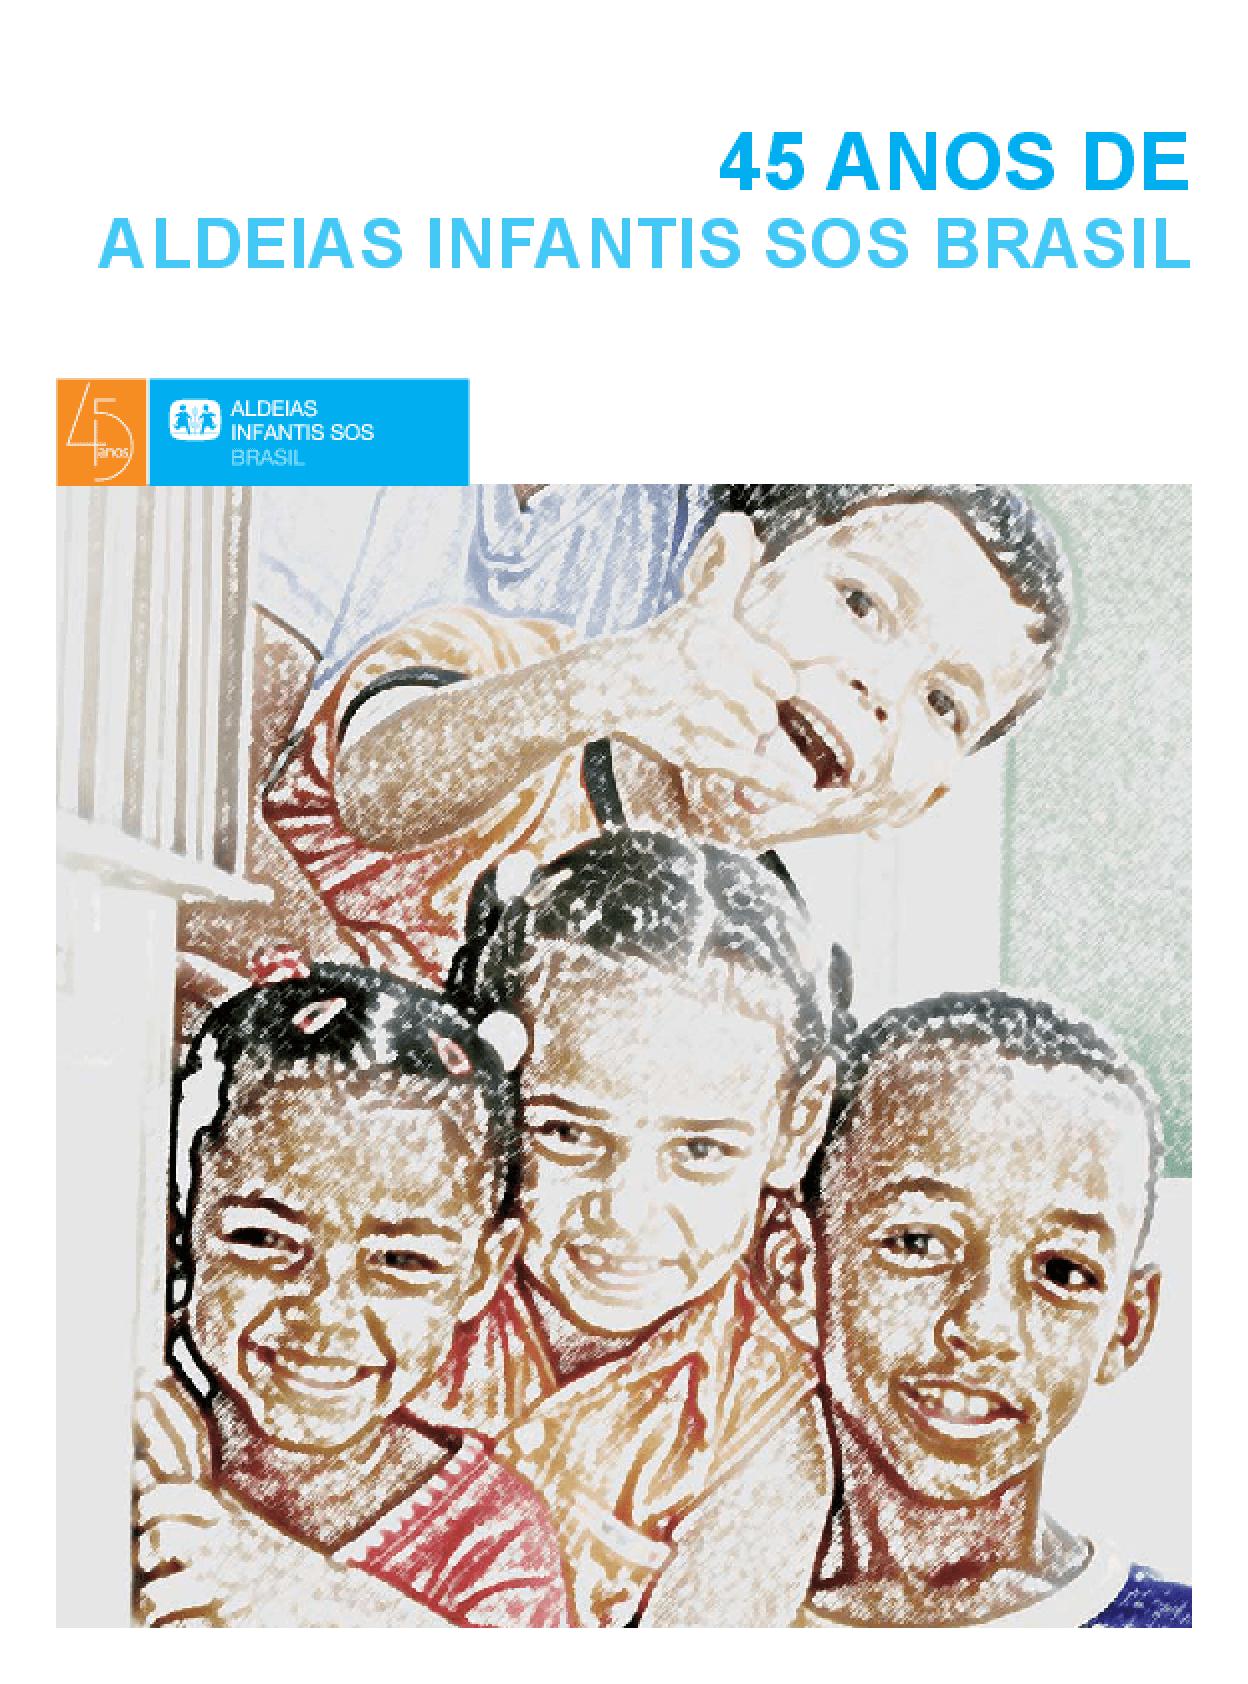 Aldeias infantis SOS Brasil - 45 anos